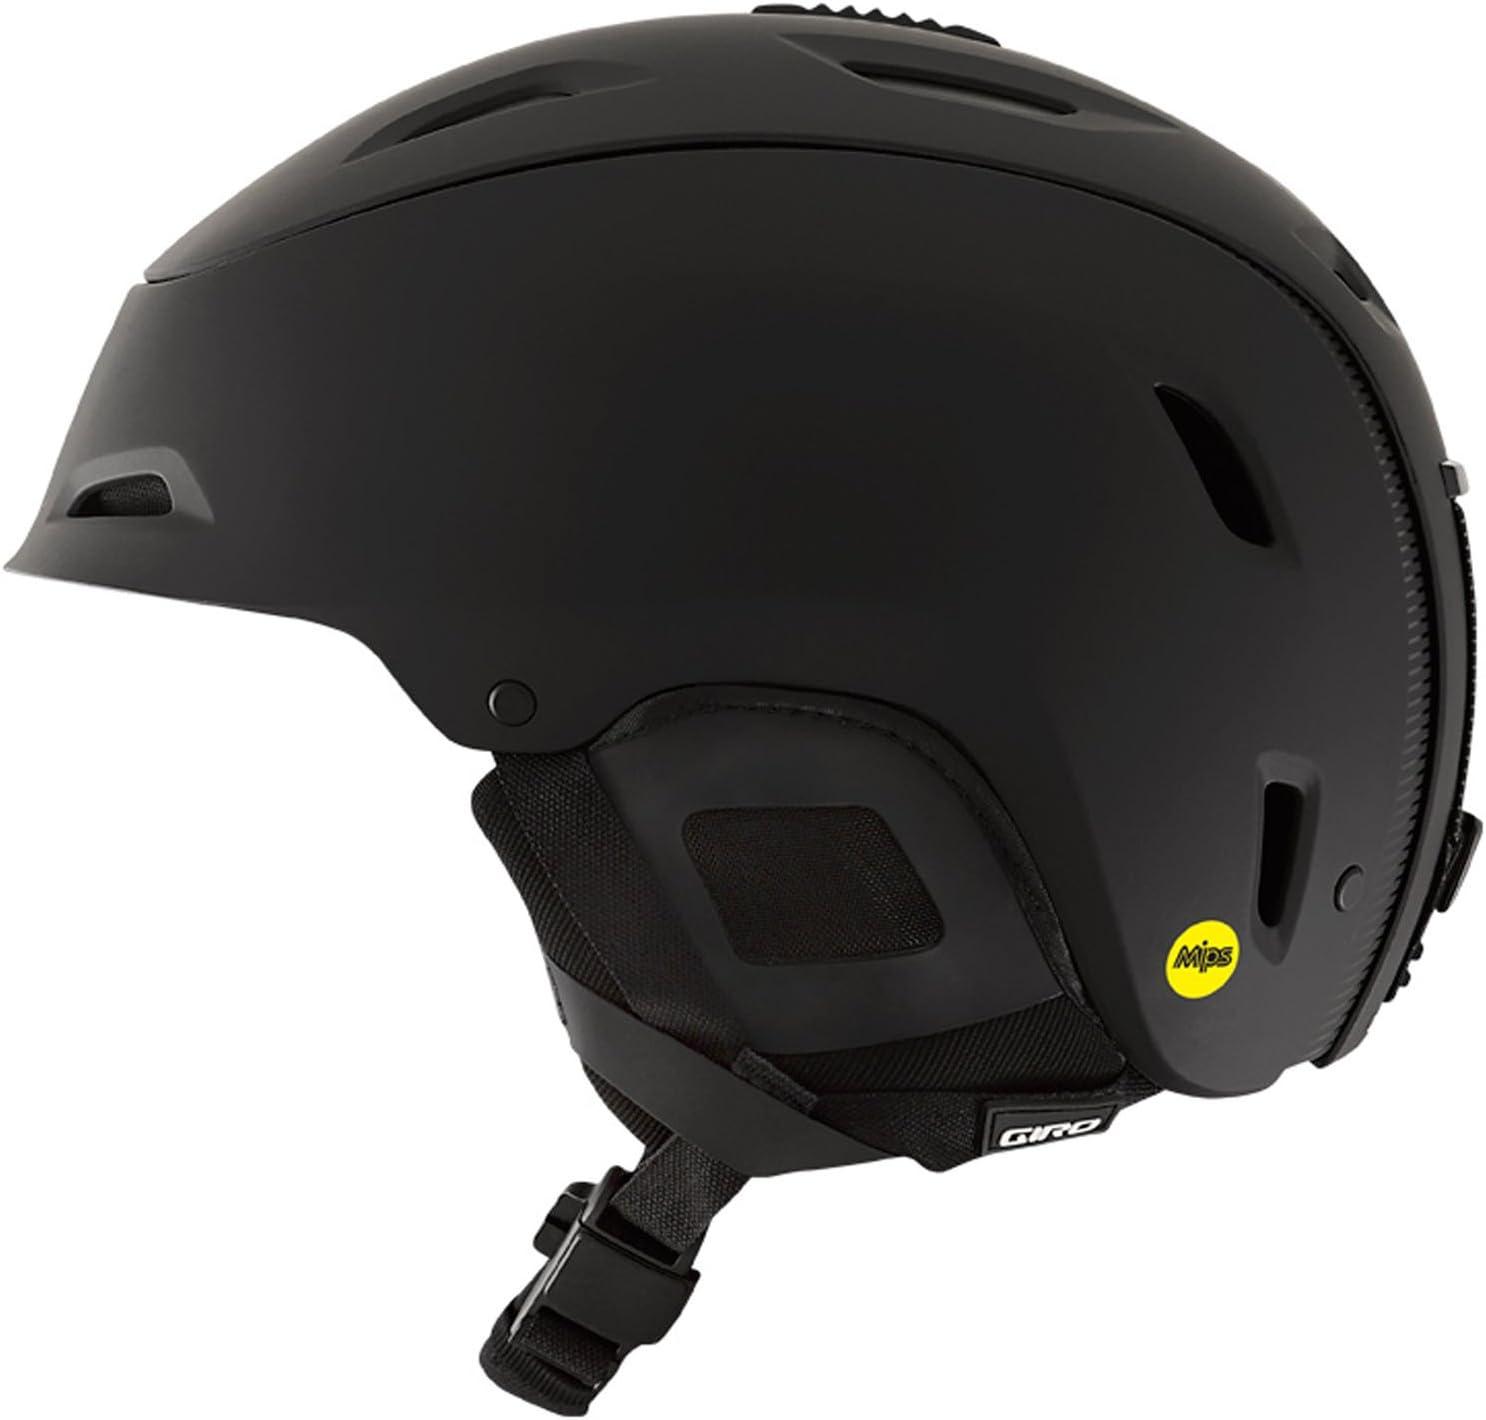 Giro Range Snowboard Ski Helmet